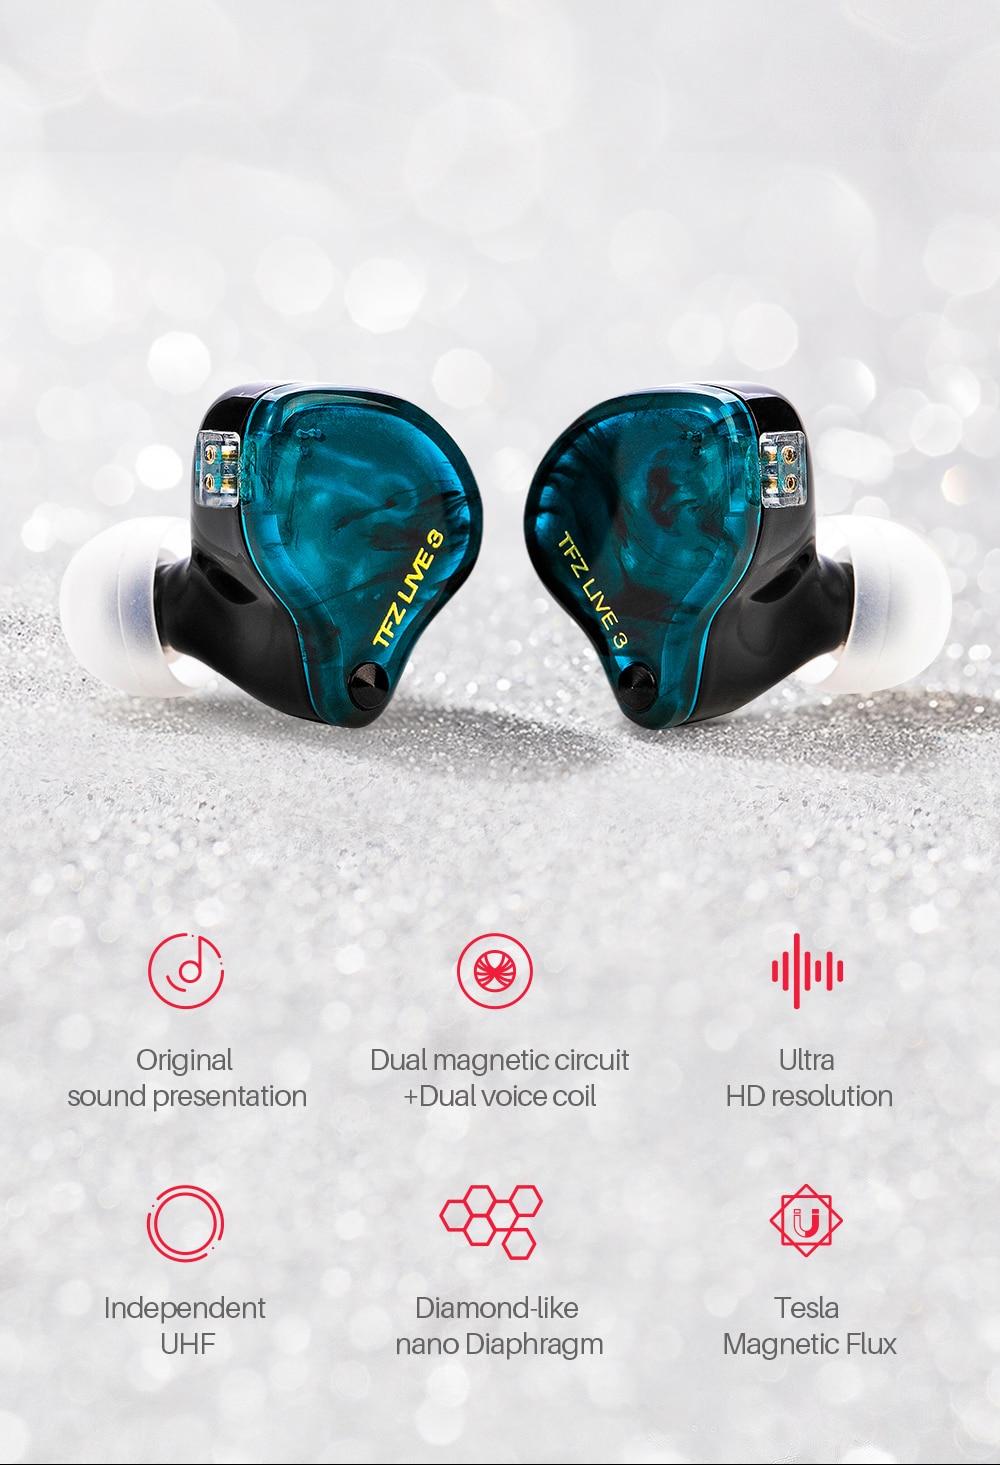 Tfz viver 3 in-ear circuito magnético duplo